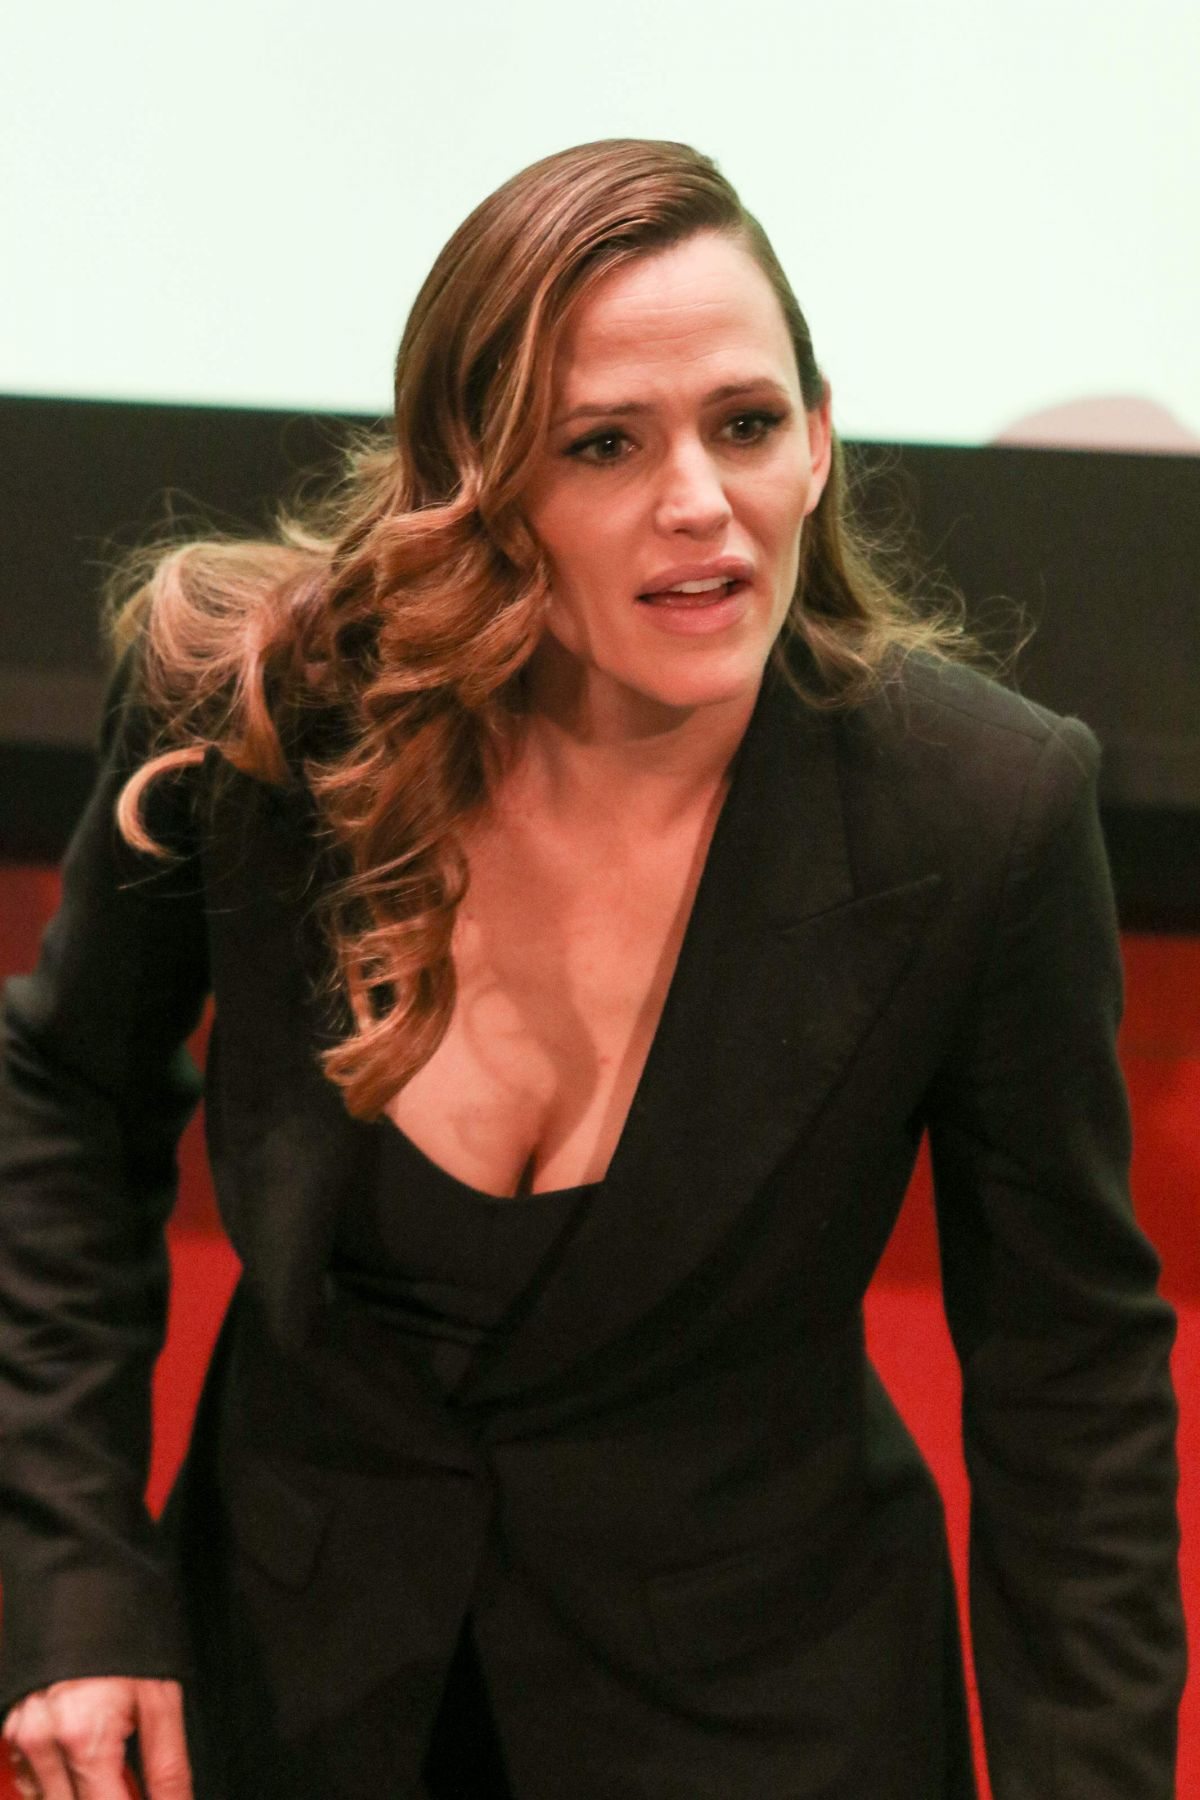 JENNIFER GARNER at 'Miracles from Heaven' Mamarazzi Screening in ... Jennifer Garner